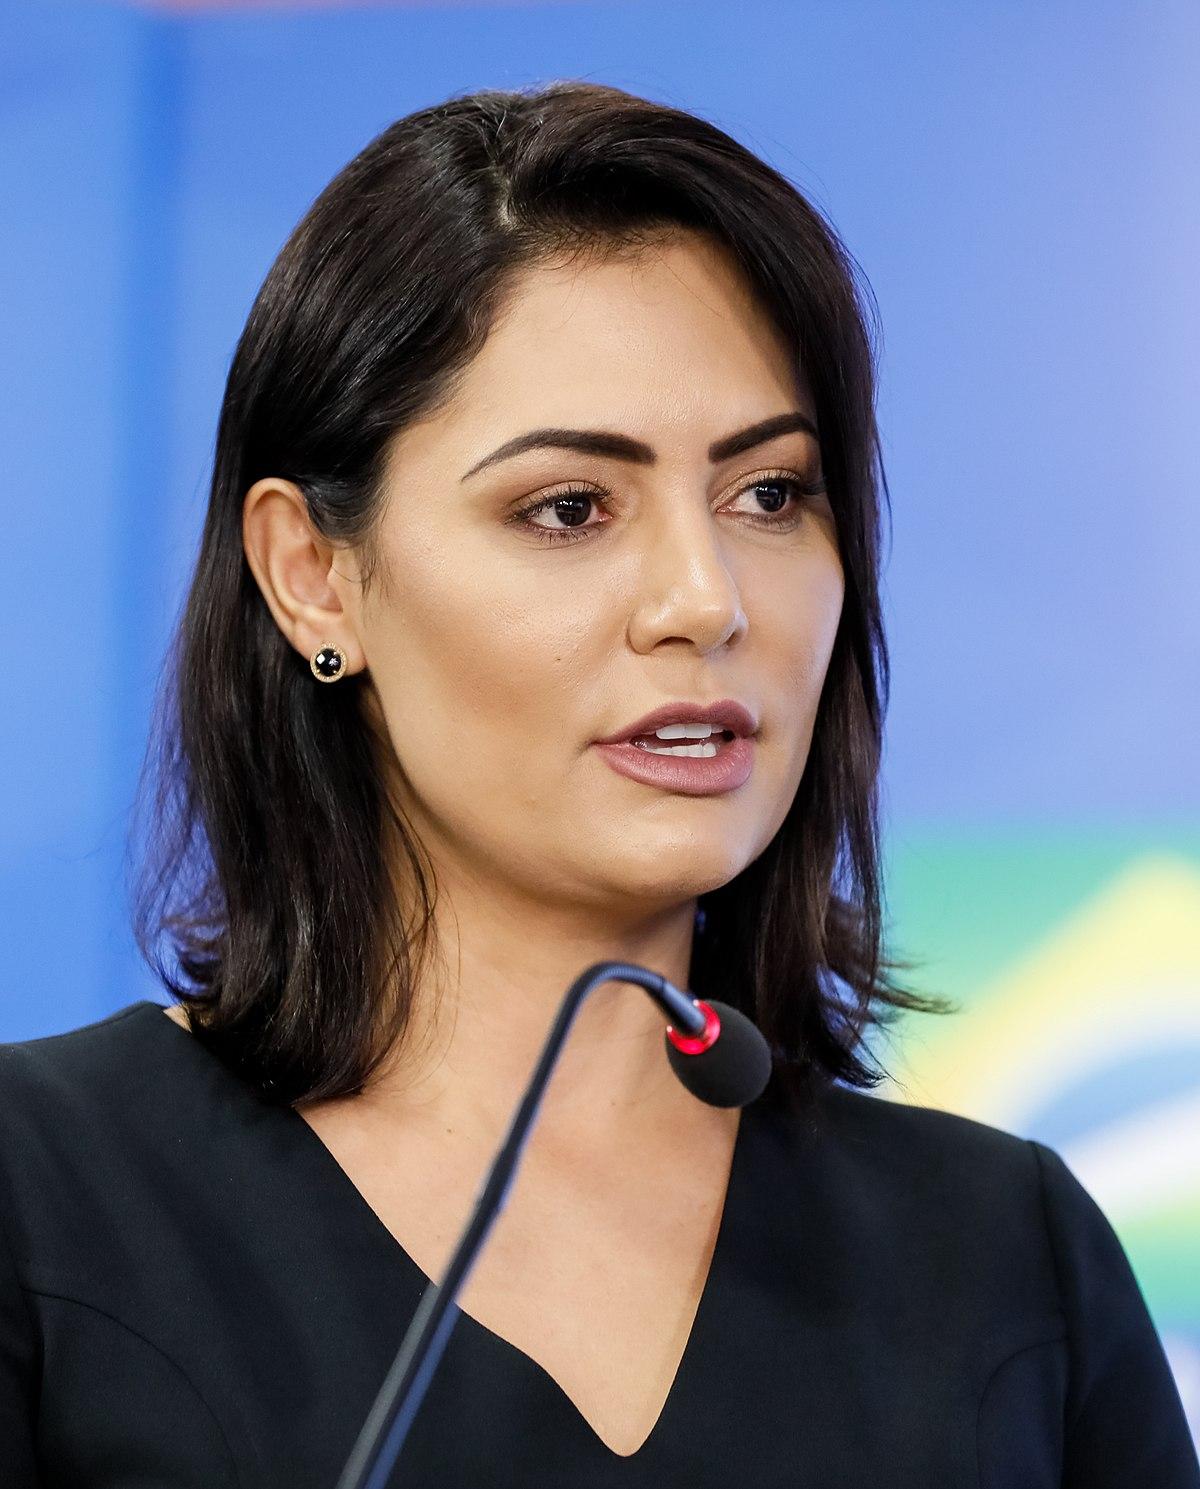 michelle bolsonaro lady brazil wikipedia president